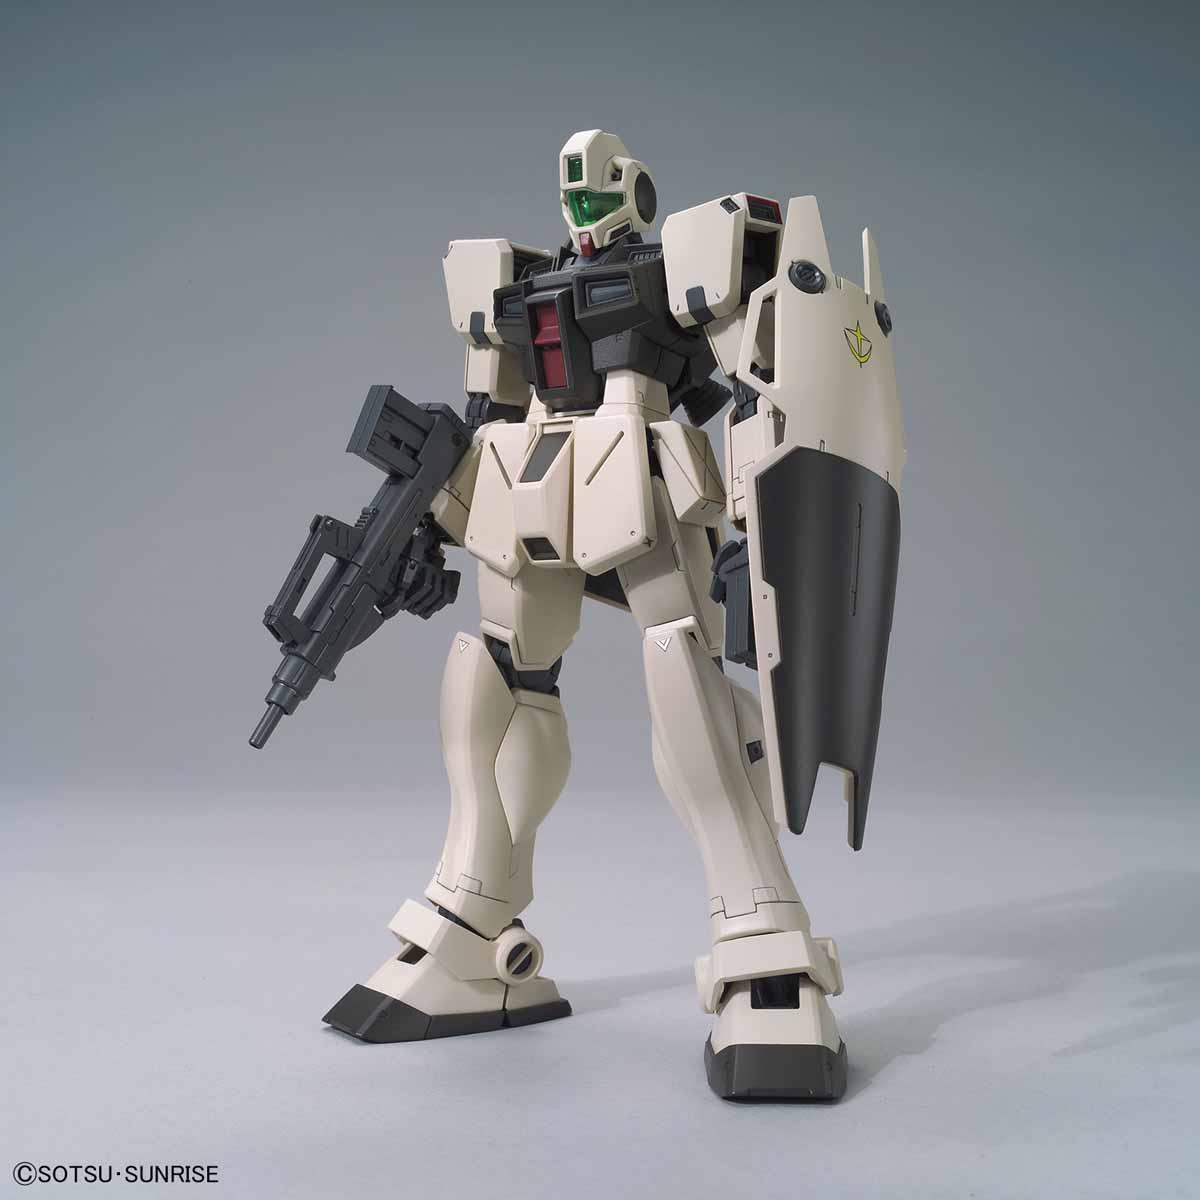 58832MG 200 1/100 RGM-79G ジム・コマンド(コロニー戦仕様) [GM Command (Colony Type)]